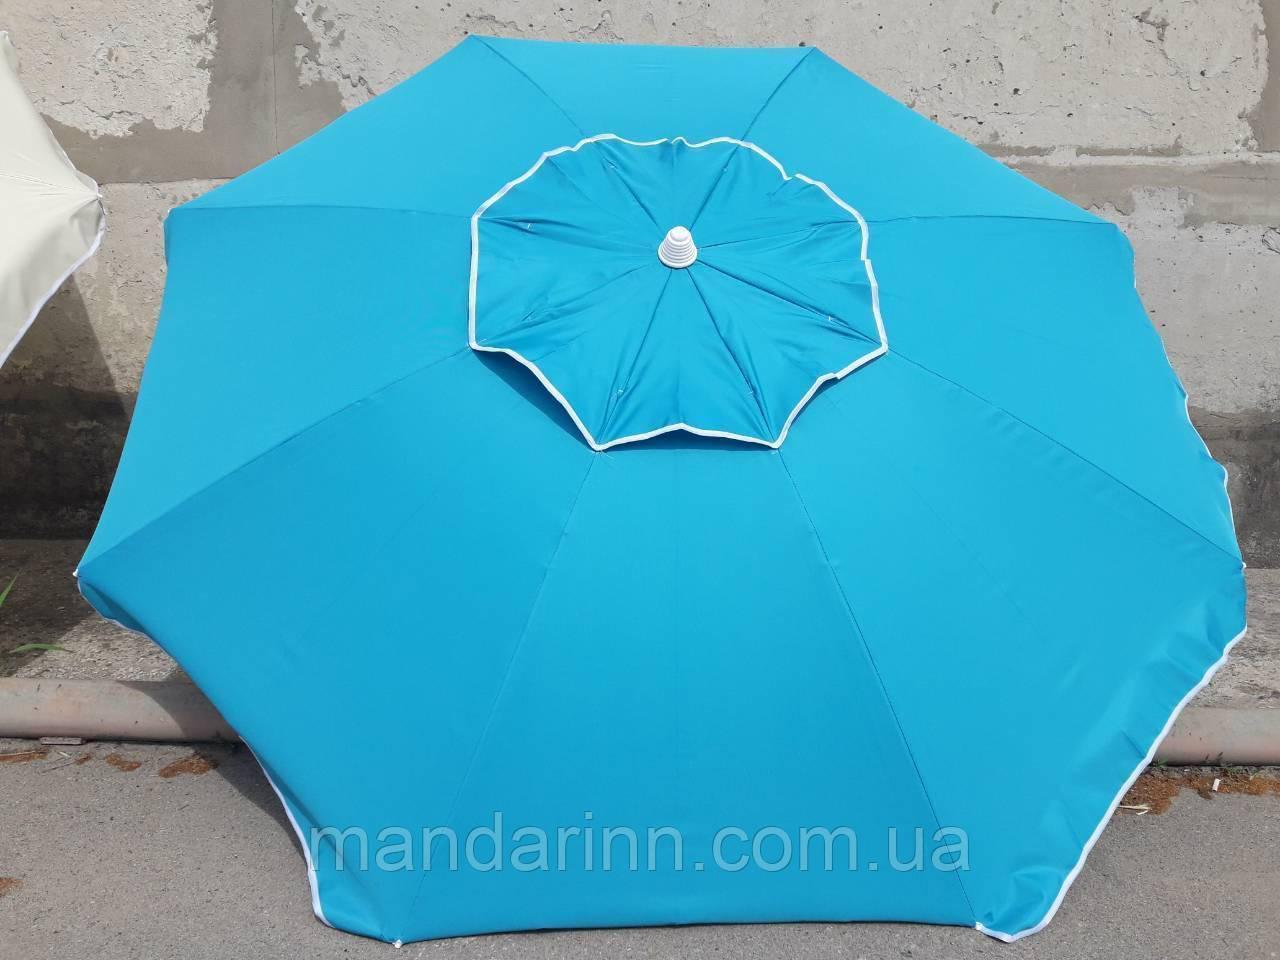 Пляжний зонт 1,8 м клапан нахил чохол червоний - фото 5